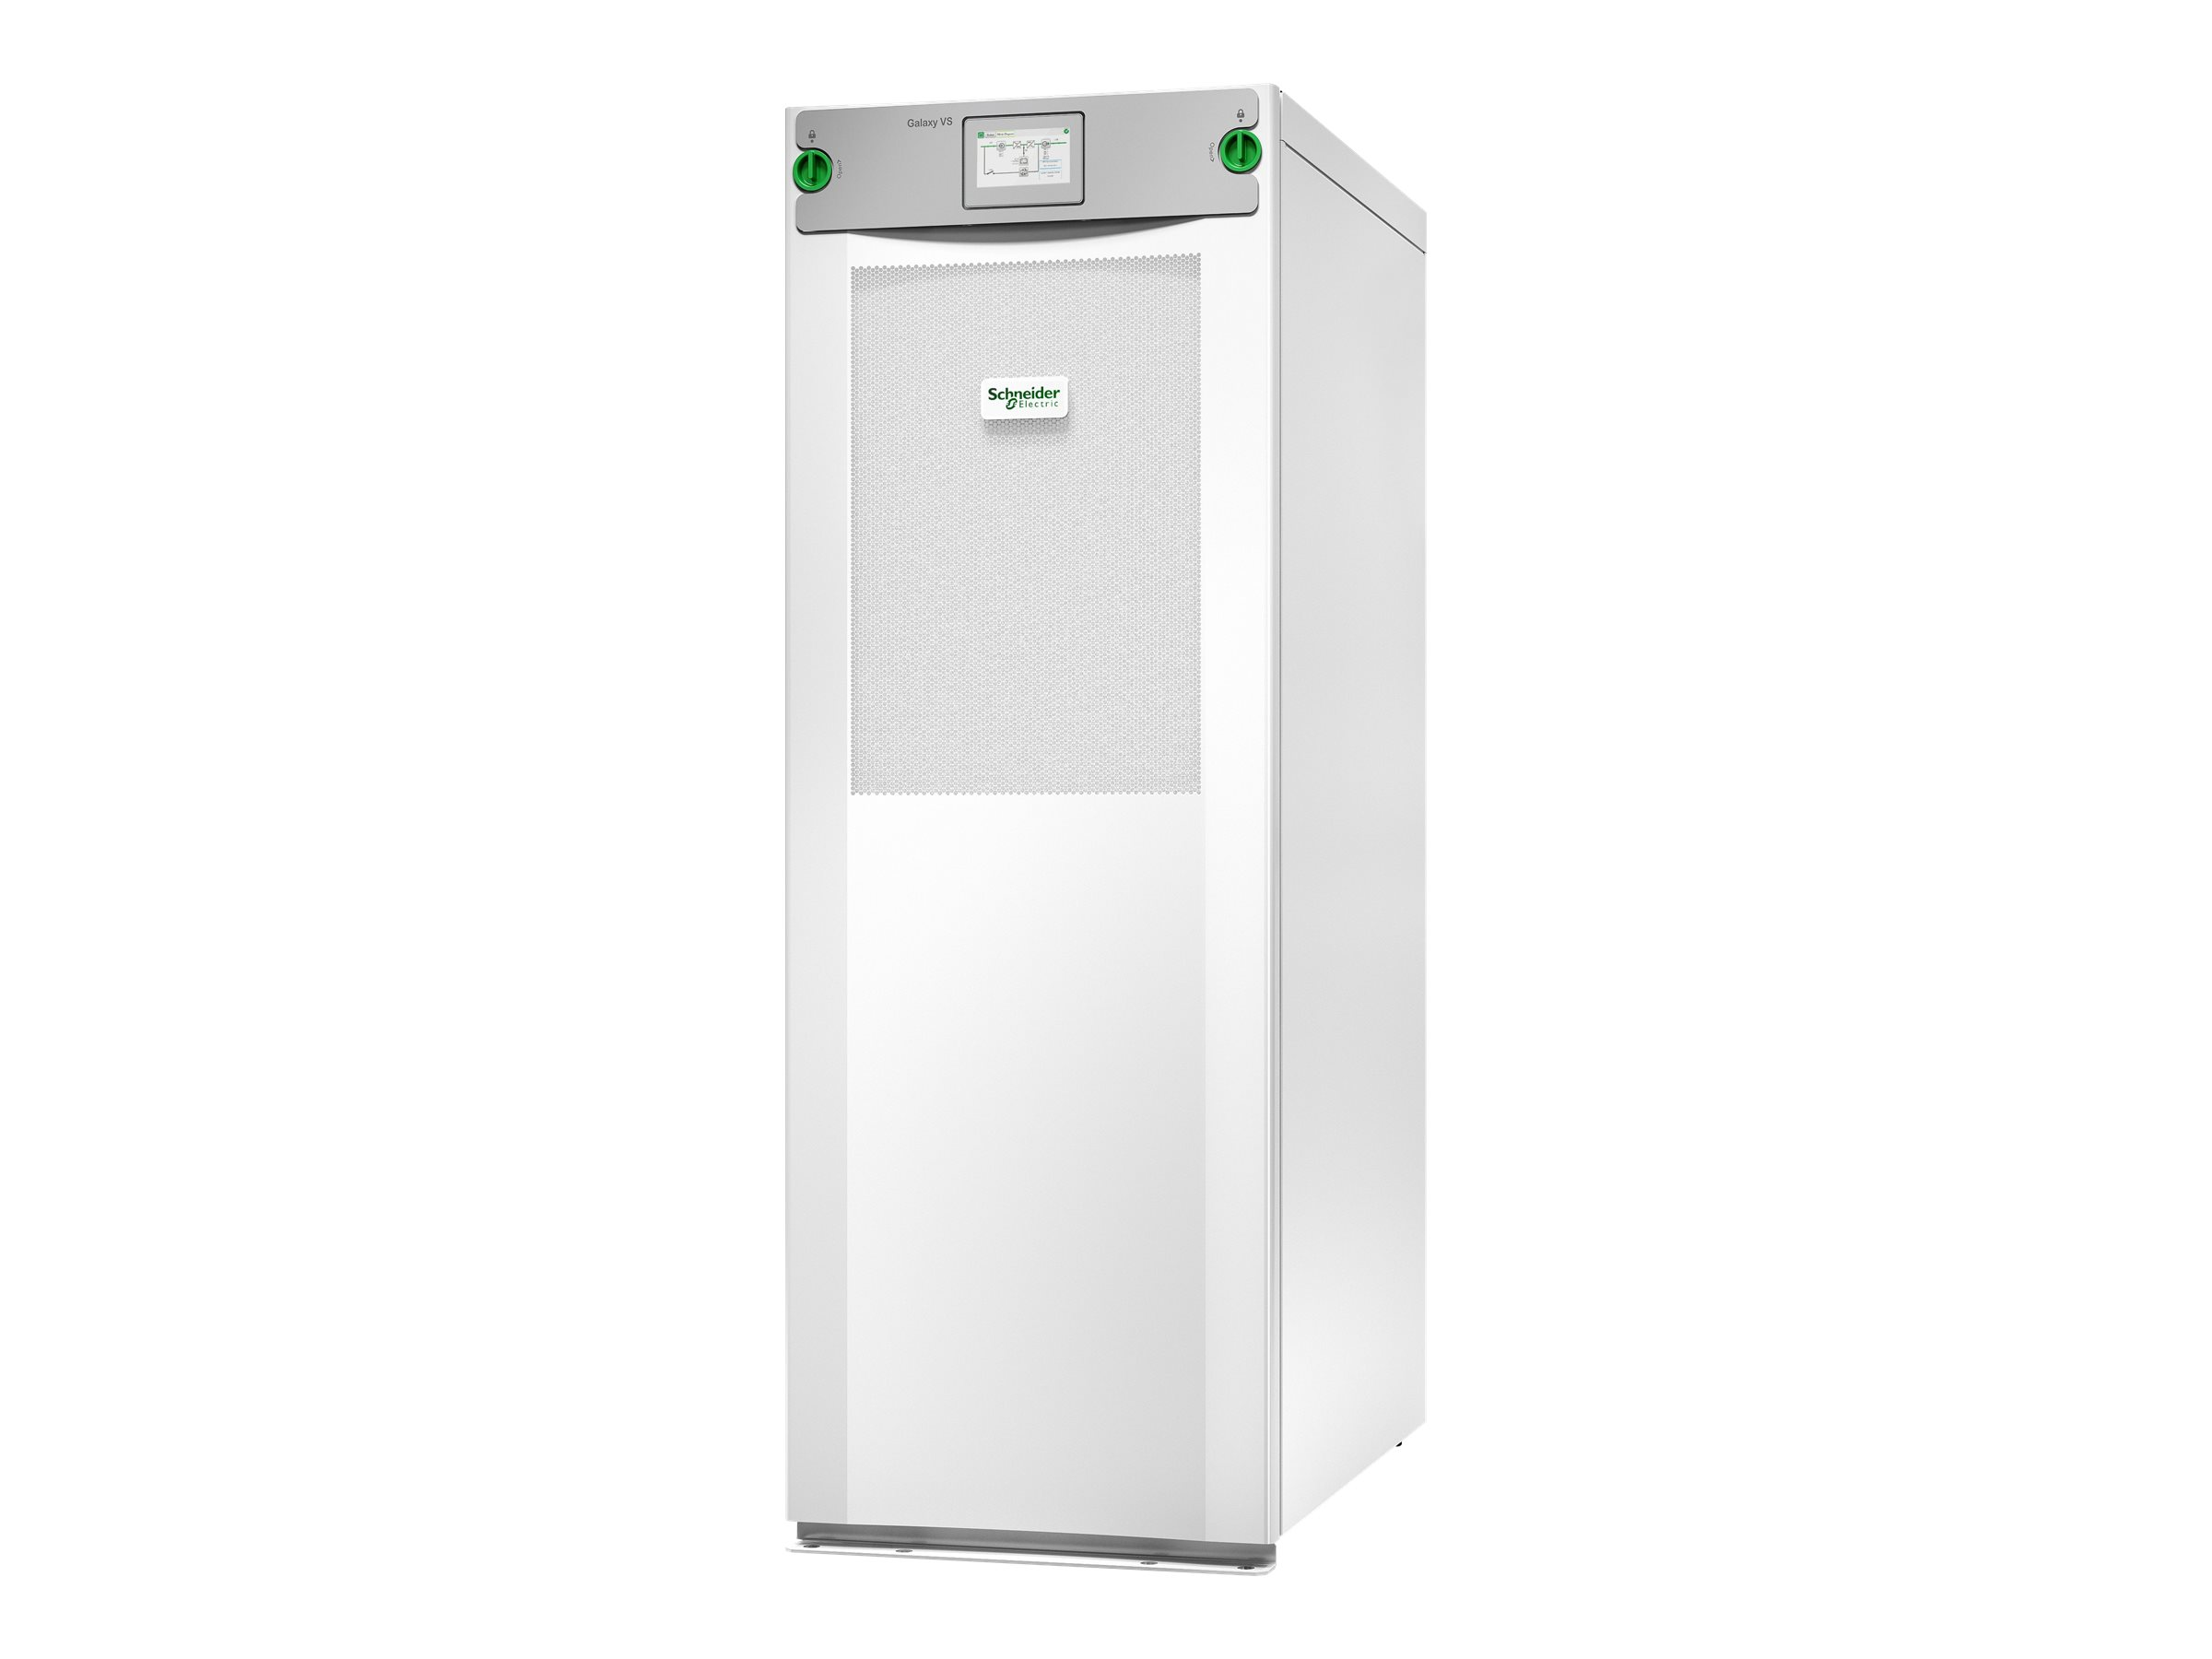 Schneider Electric Galaxy VS GVSUPS60KHS - USV - Wechselstrom 400 V - 60 kW - 60000 VA - 3 Phasen